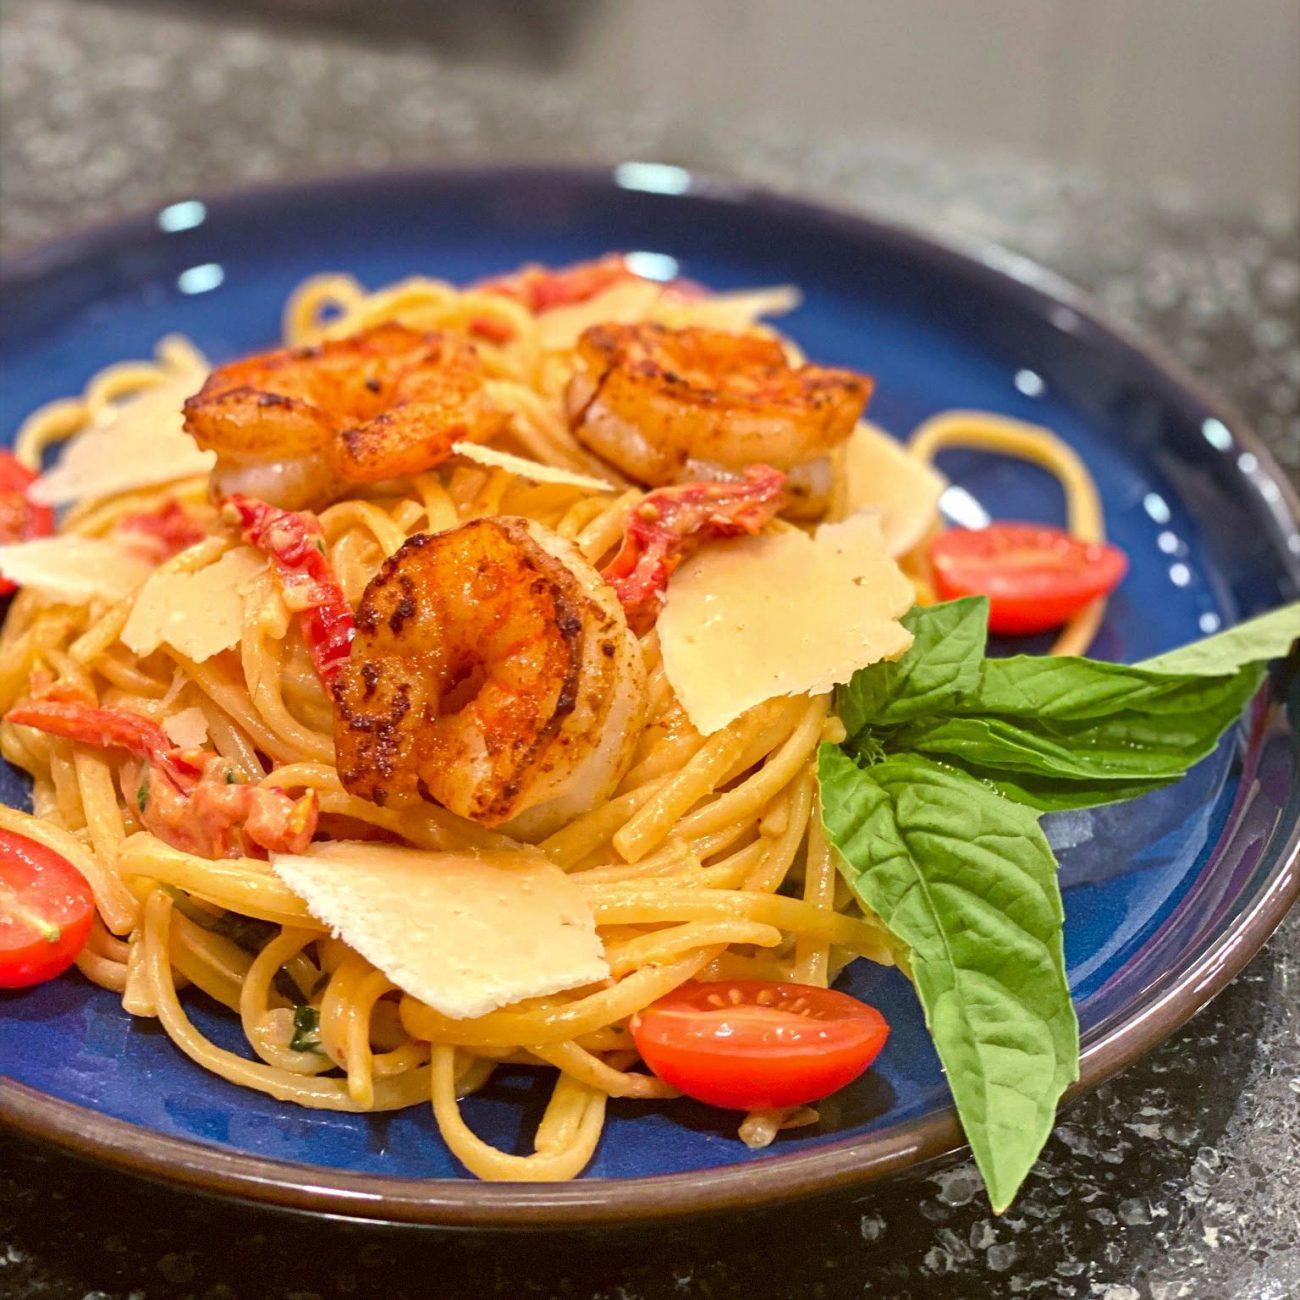 Pasta with Shrimp in Creamy Tomato Sauce